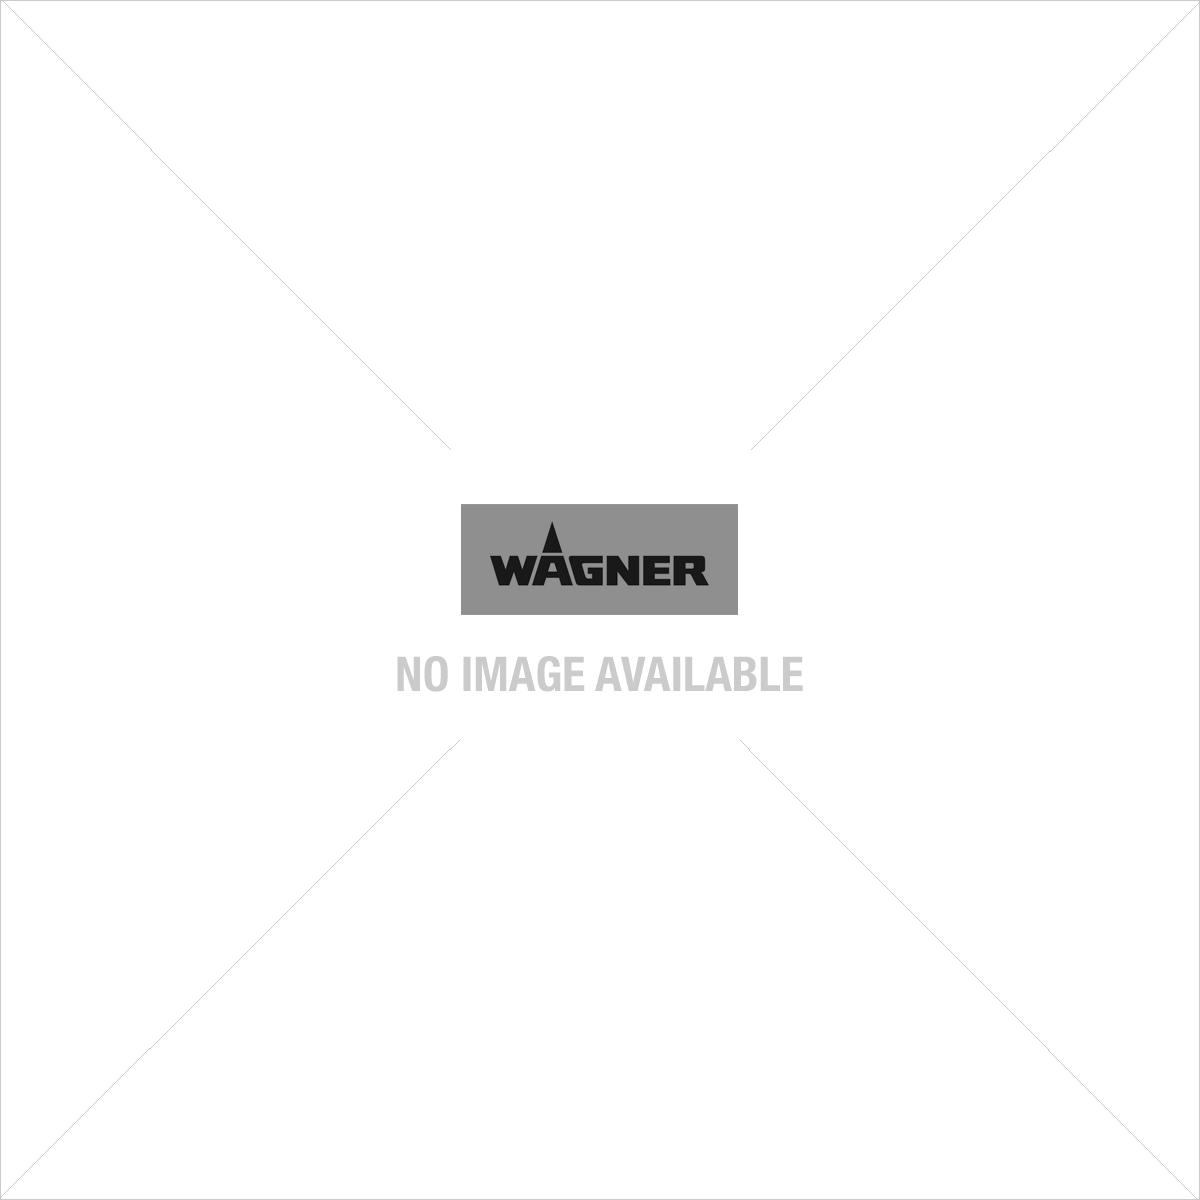 wagner universal sprayer w 690 pistolet peinture basse. Black Bedroom Furniture Sets. Home Design Ideas